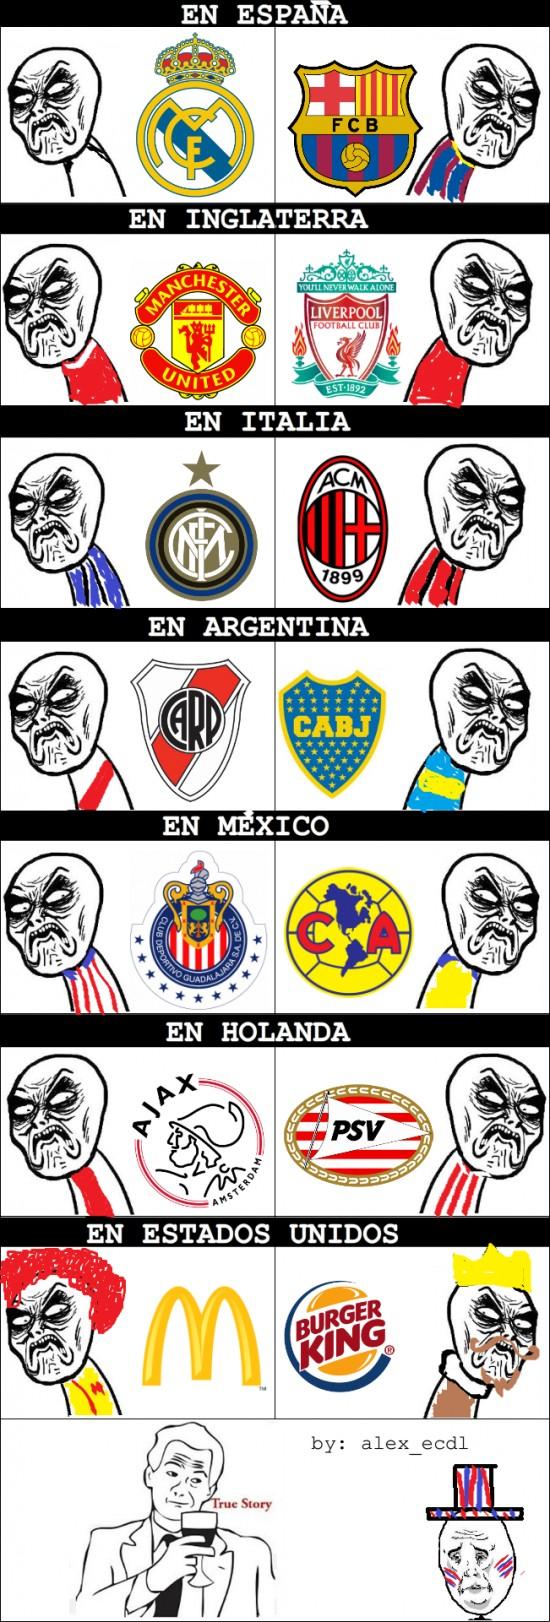 Ajax,America,Barcelona,Boca,Chivas,Fútbol,Inter,Liverpool,McDonalds,Milan,PSV,Real Madrid,River,United